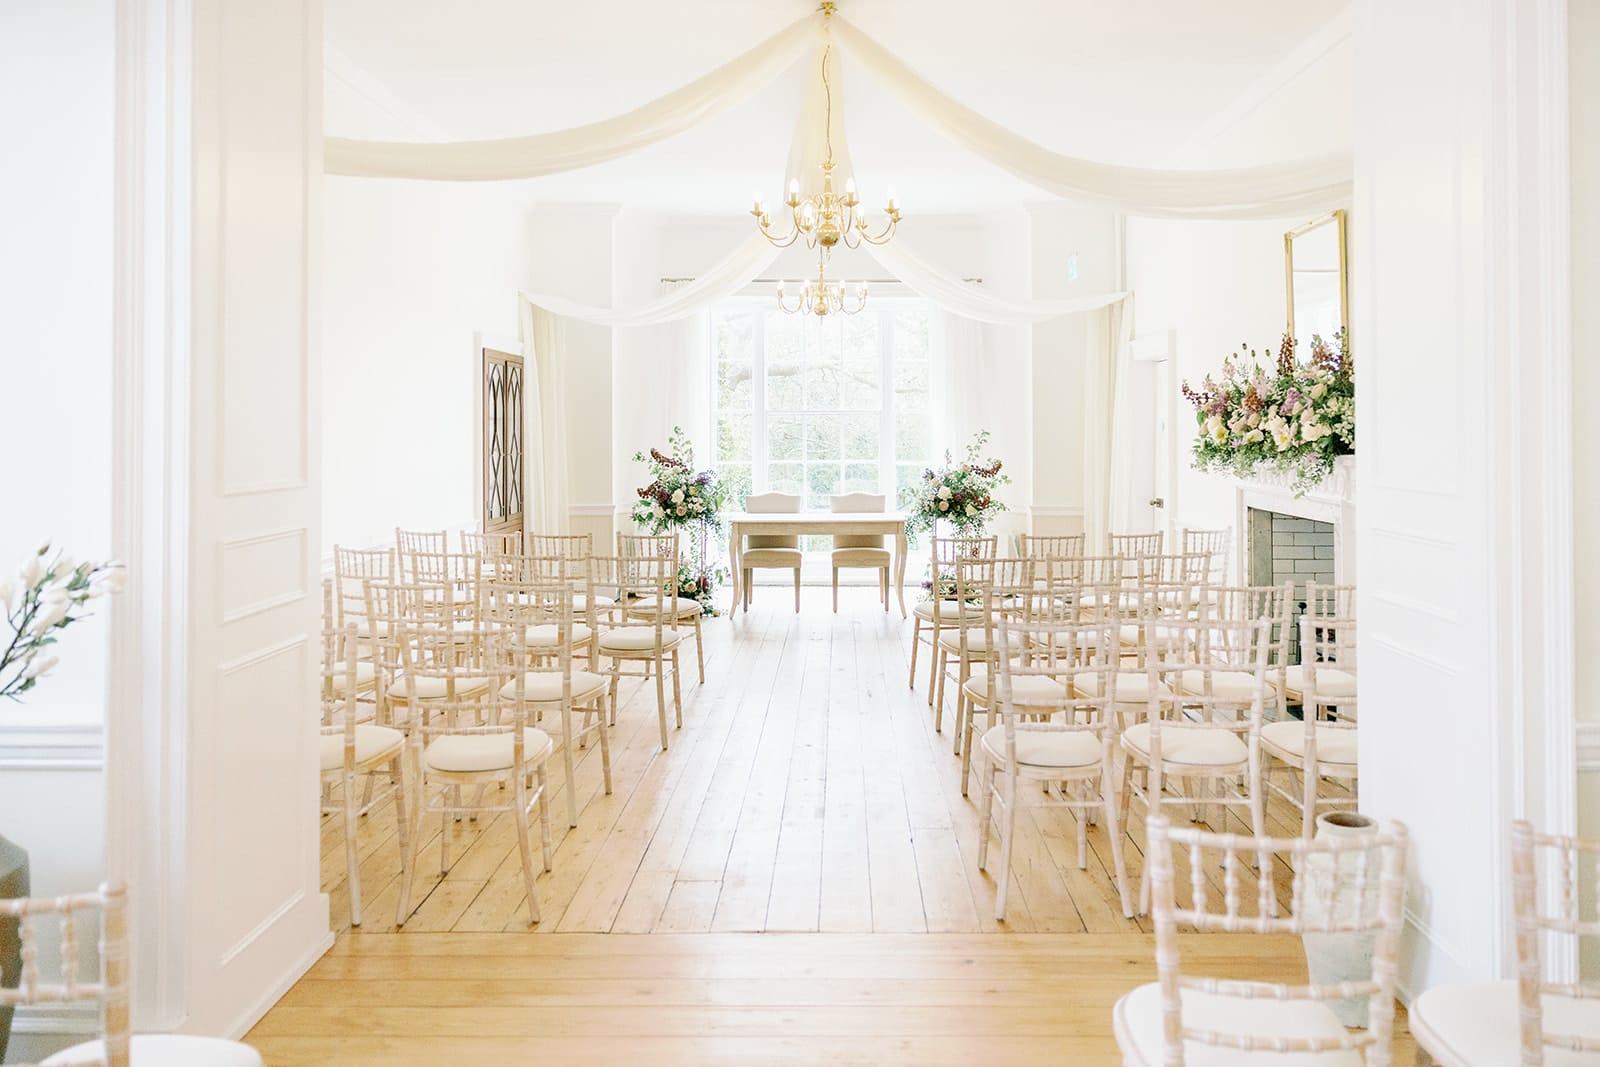 Ceremony at Pelham House wedding venue in Lewes